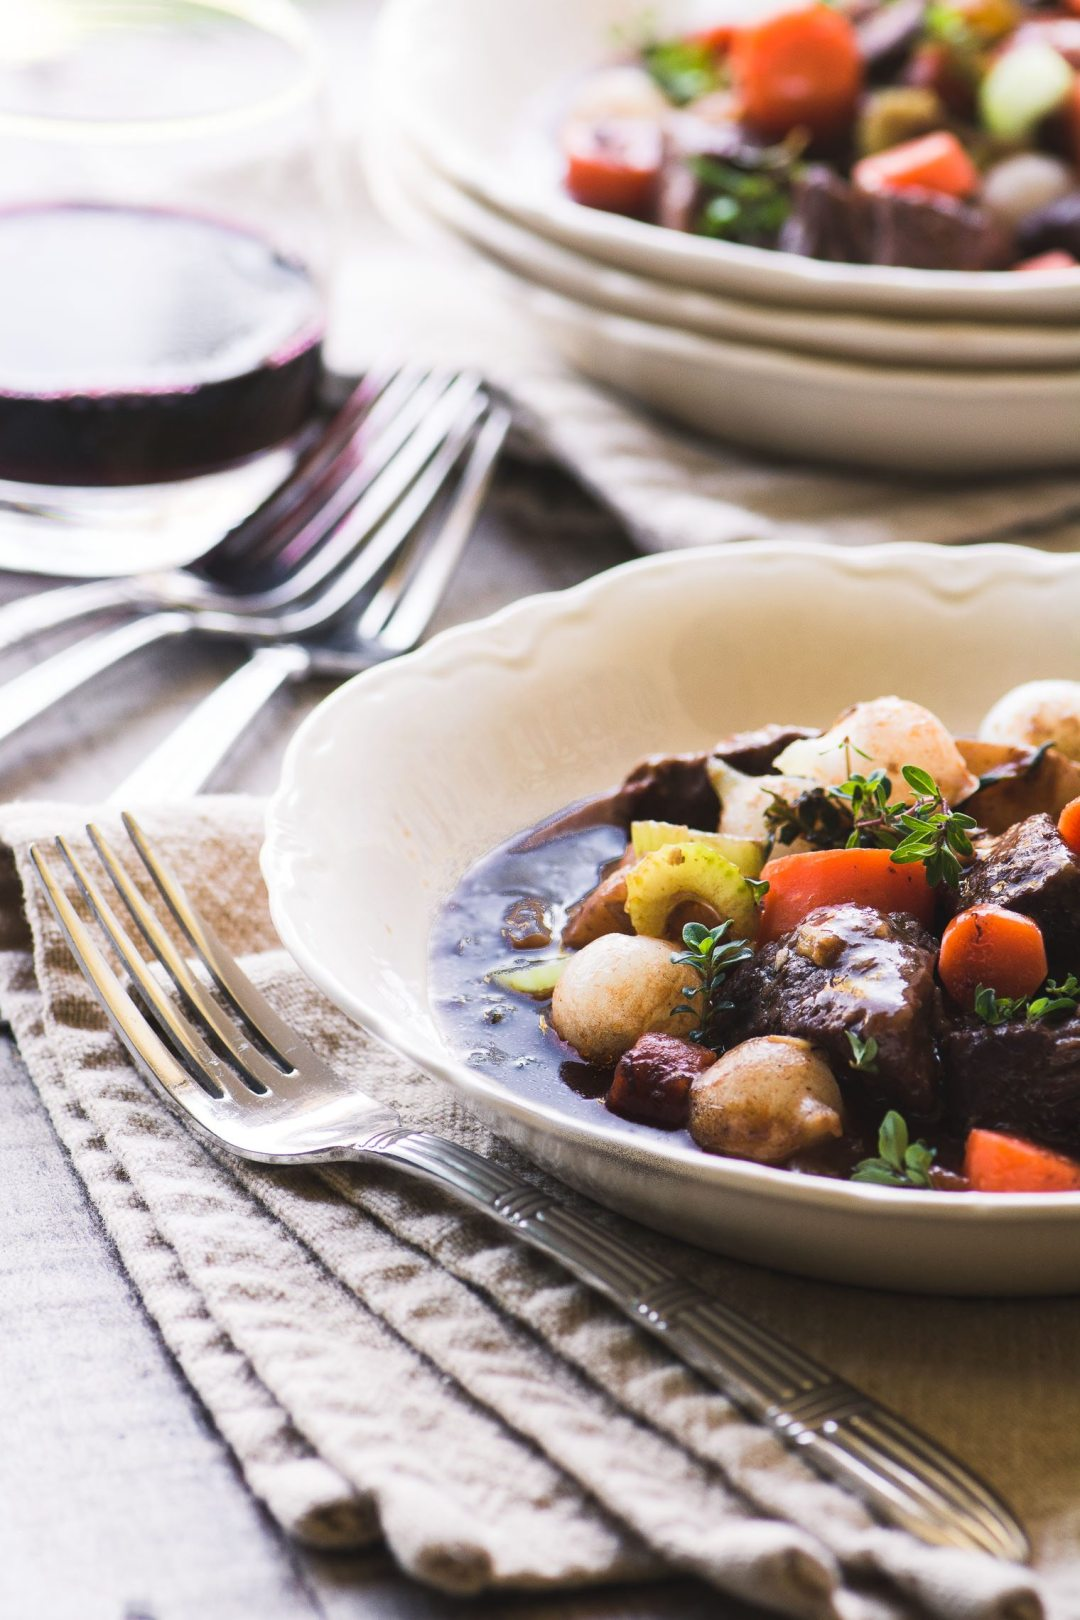 Instant Pot Beef Bourguignon in white bowls